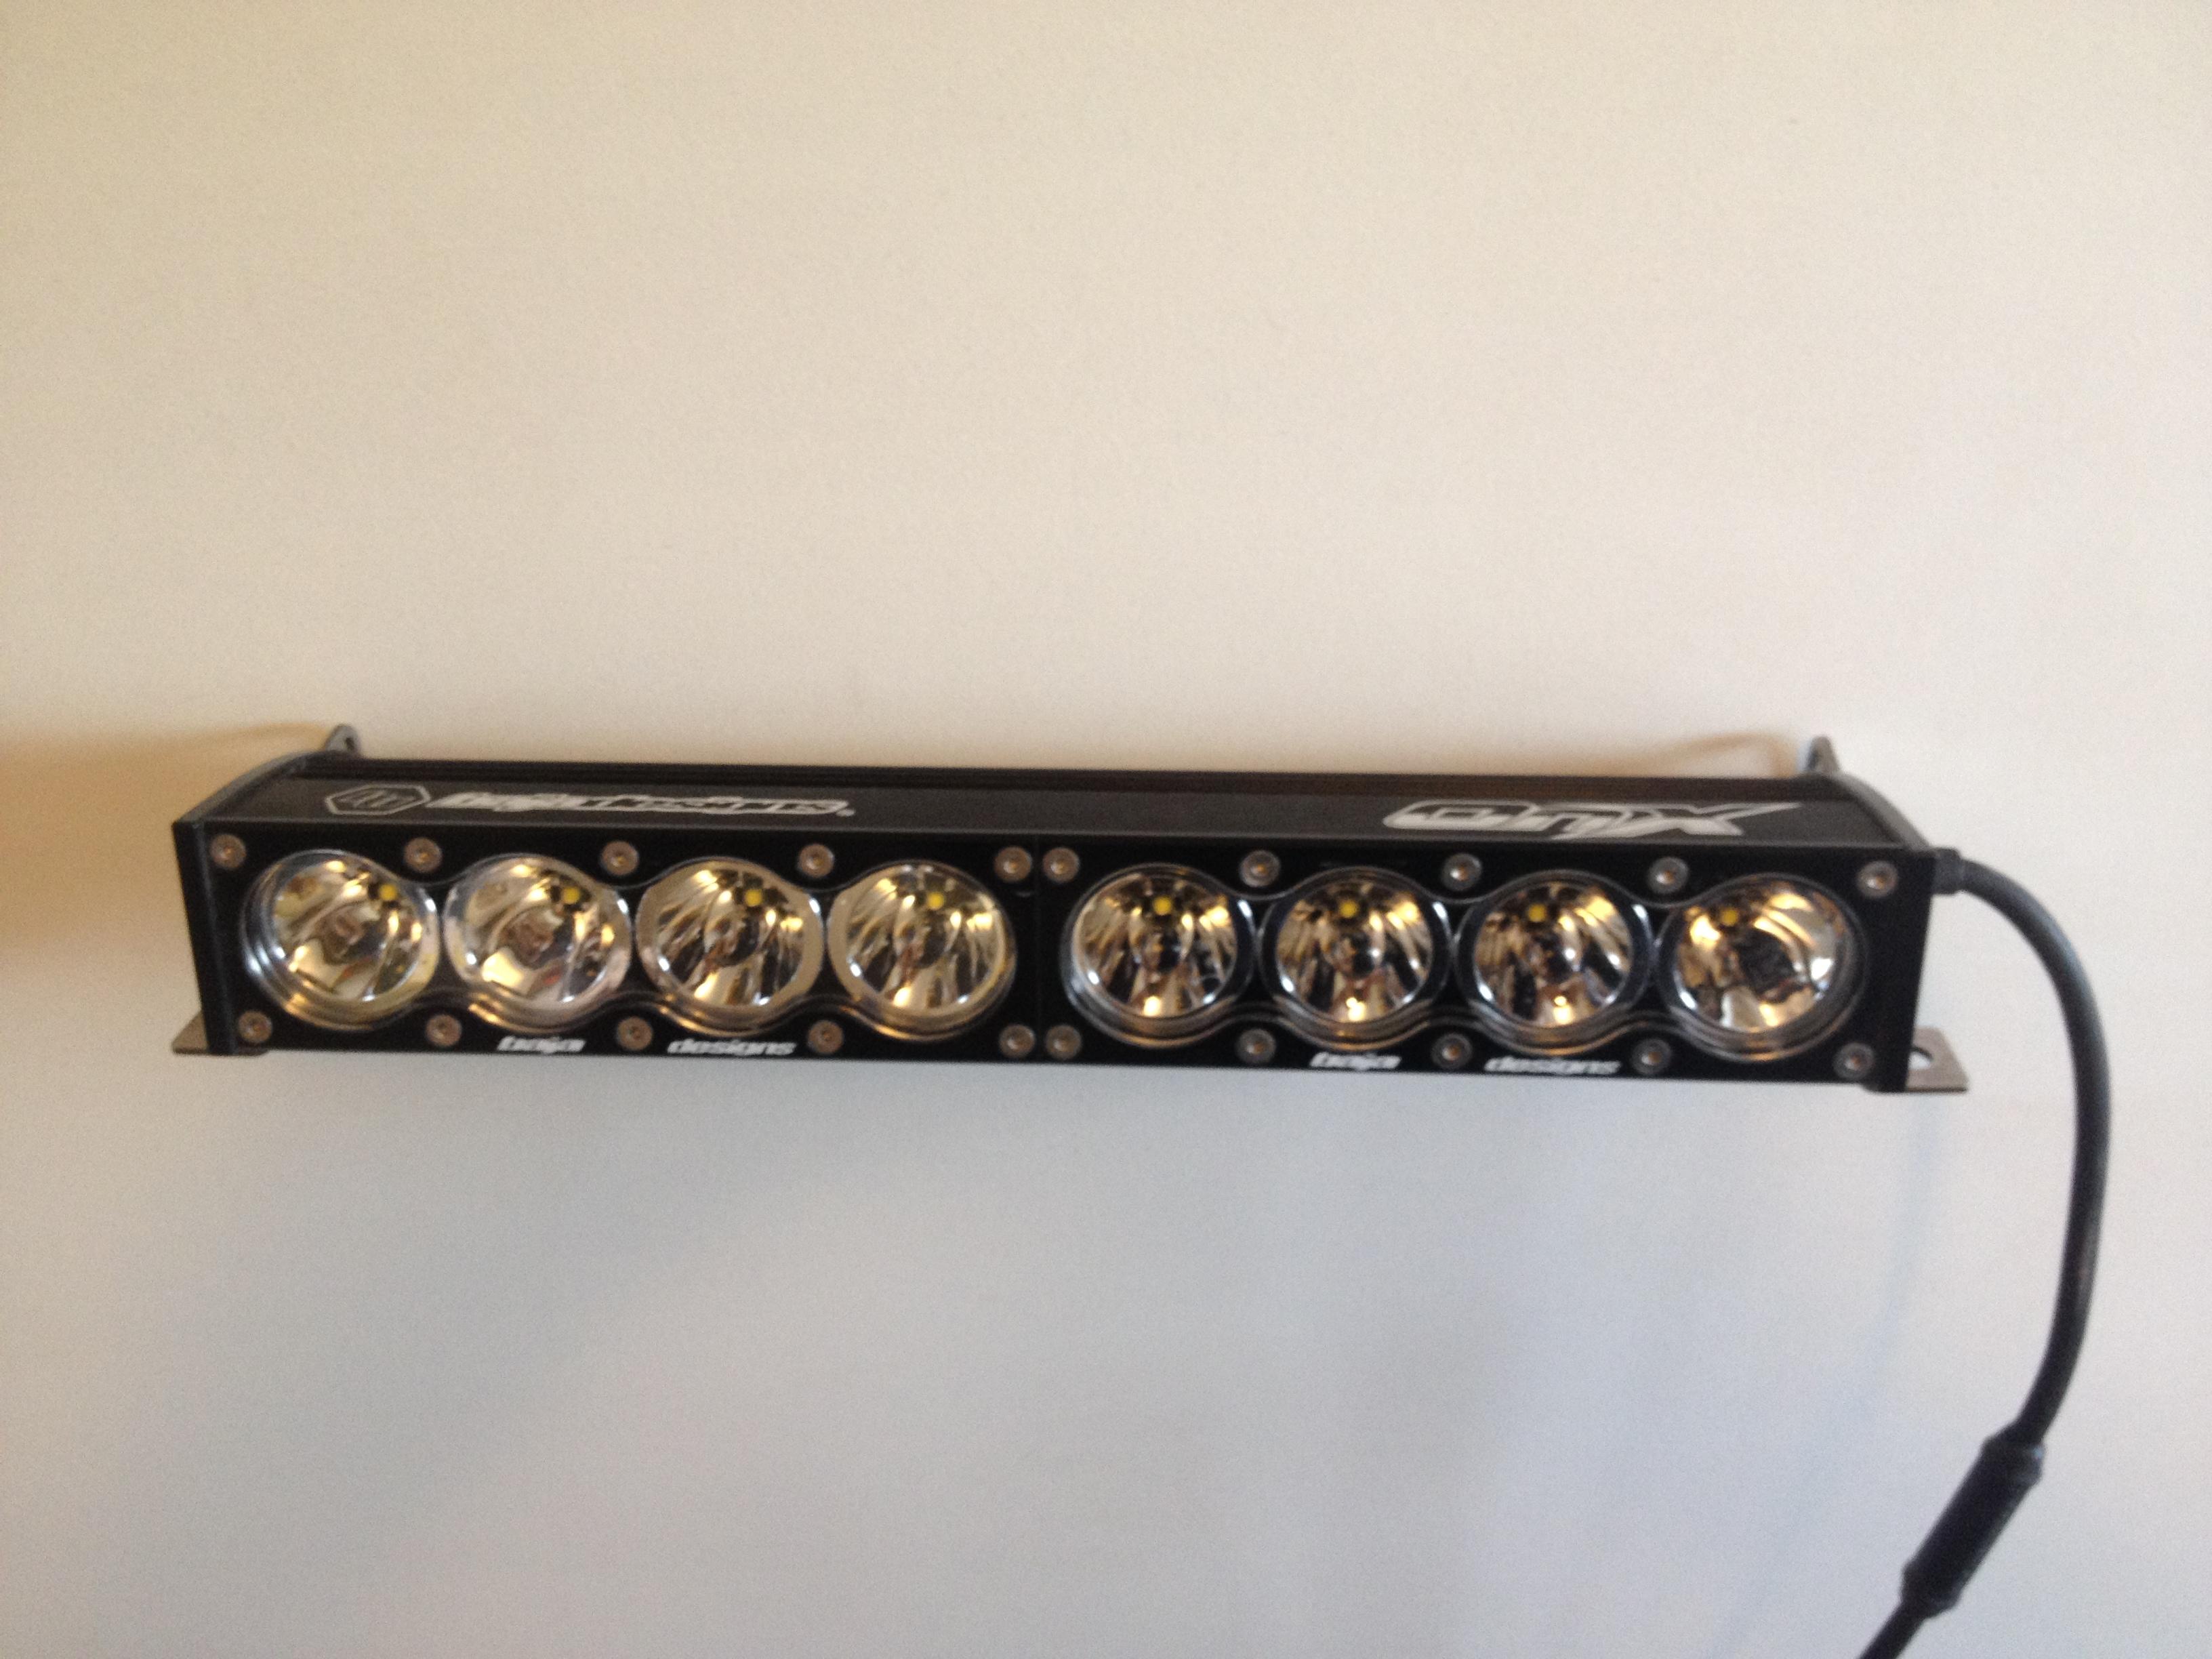 Baja Designs Led Light Bars